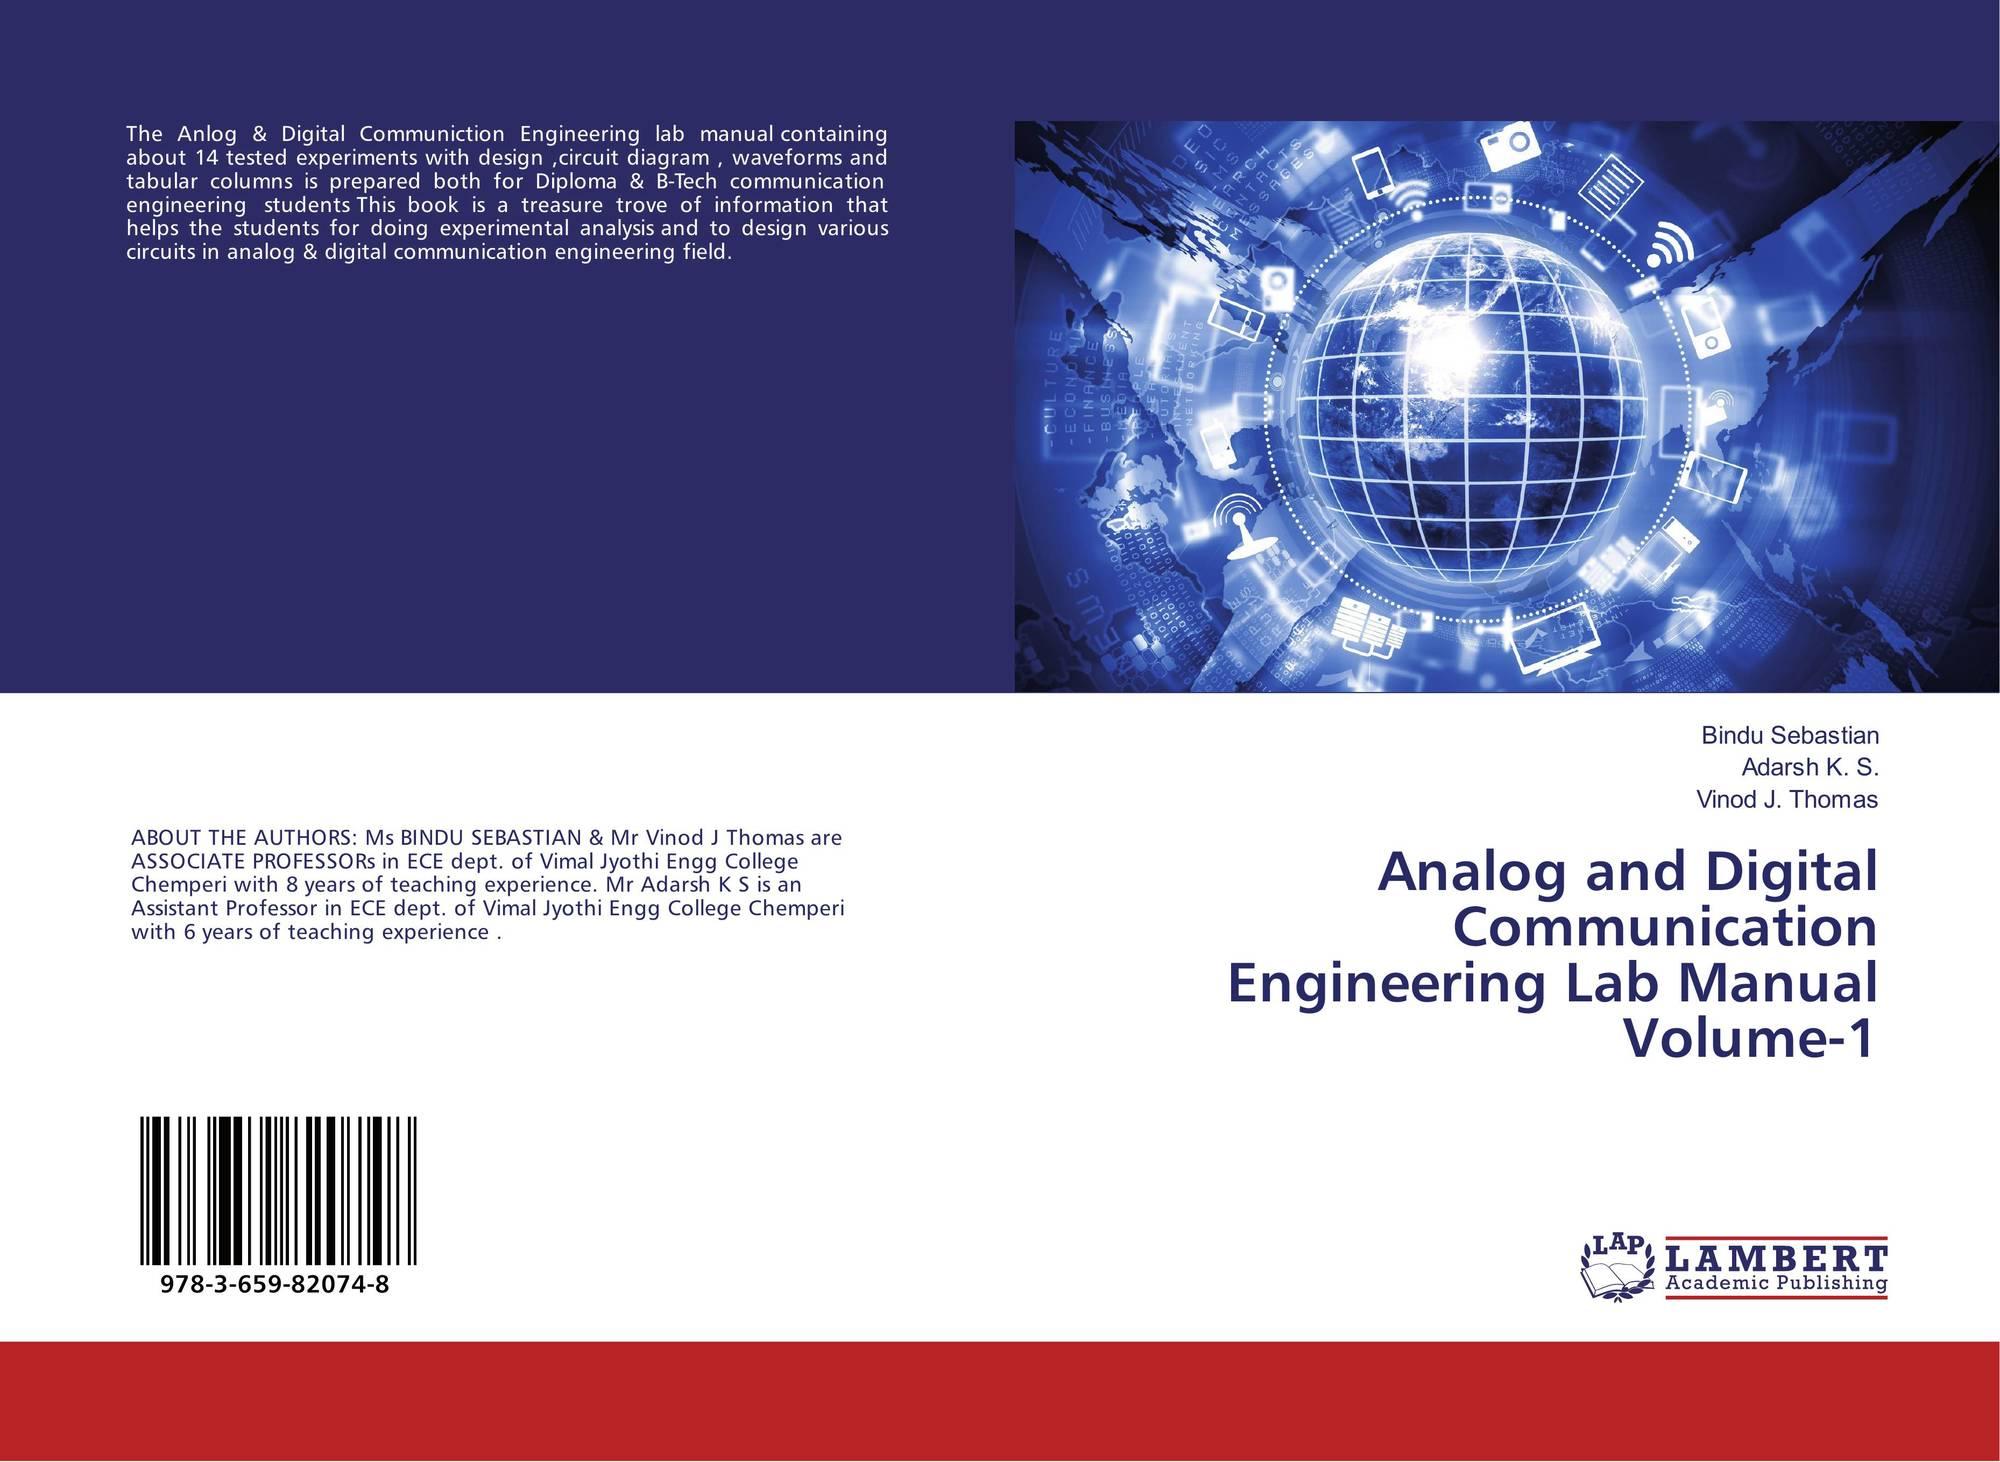 ... Digital Communication Engineering Lab Manual Volume-1. 9783659820748